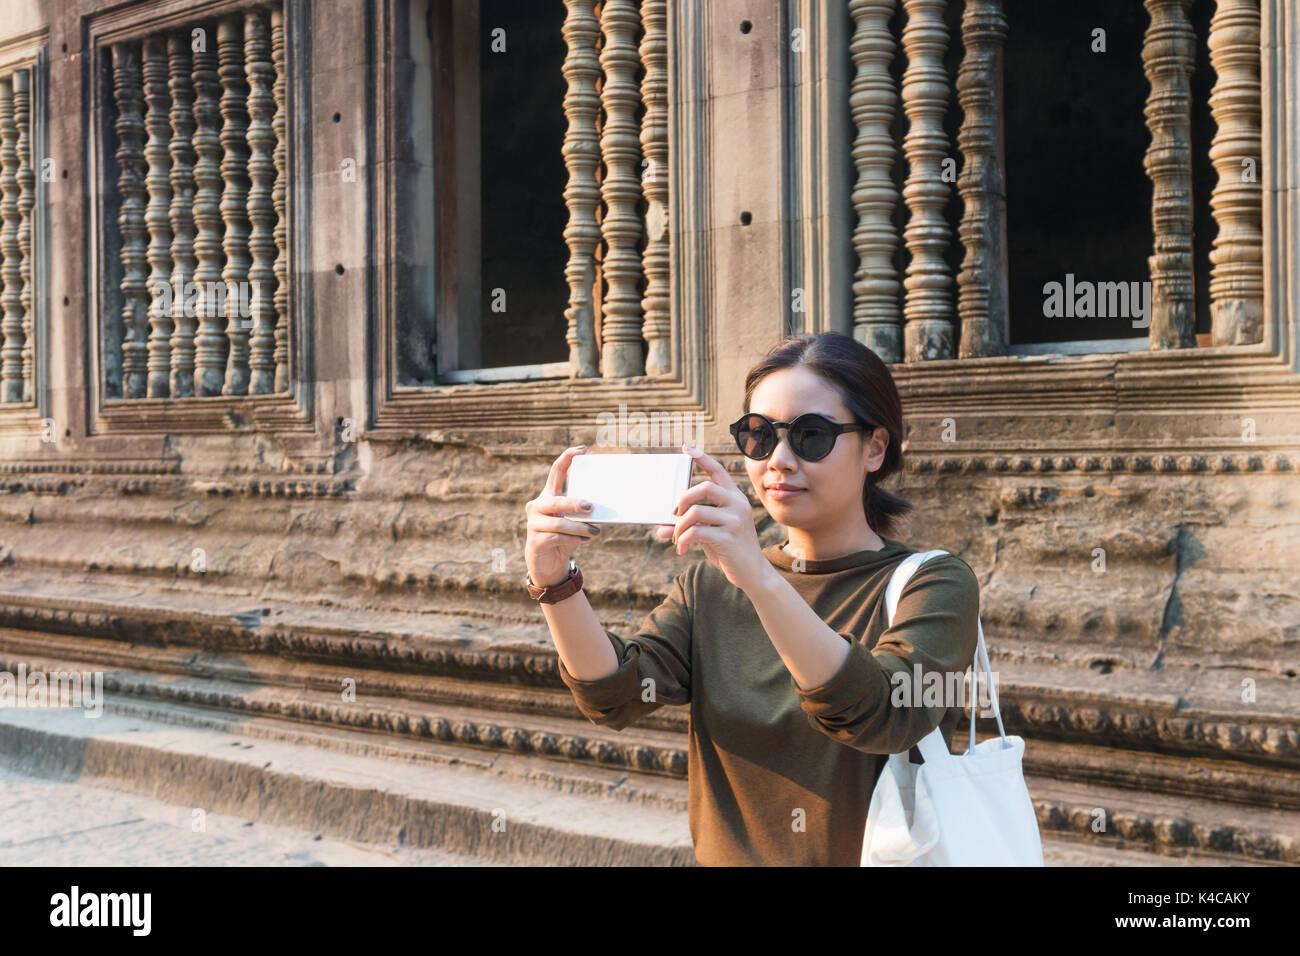 Female traveler prenant des photos avec son smartphone à Angkor Wat siem reap Cambodge Photo Stock